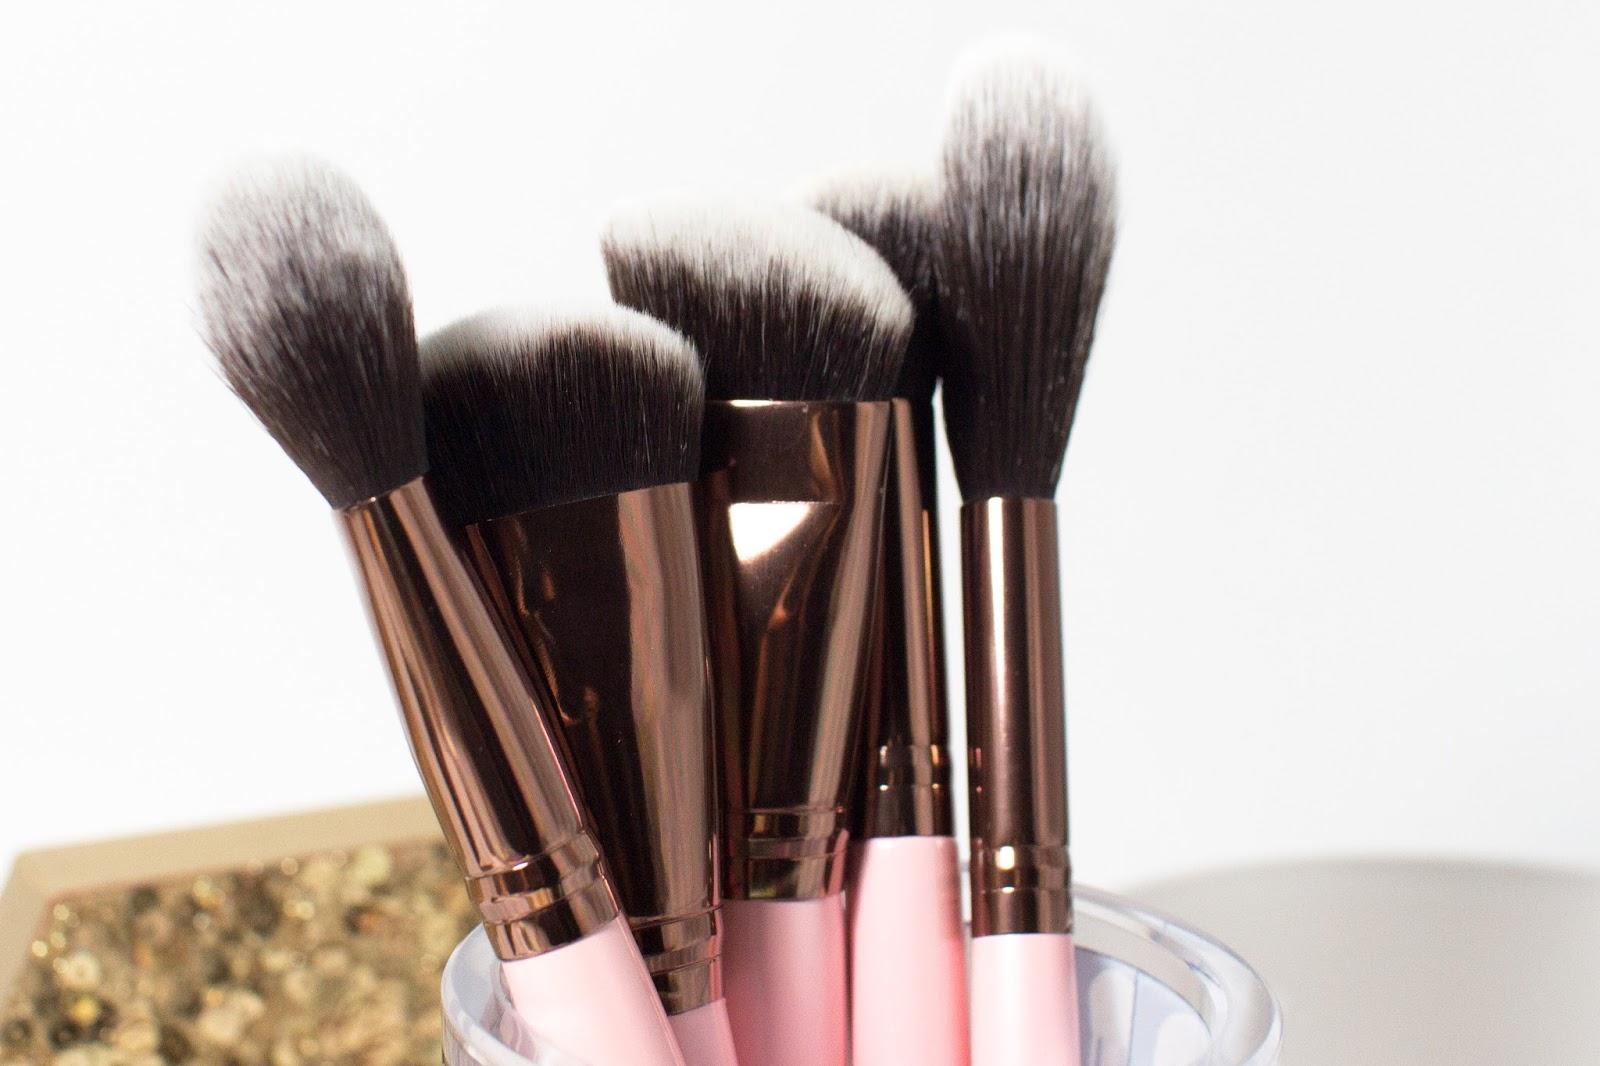 Anti-Bacterial Brush Set by Look Good Feel Better #9